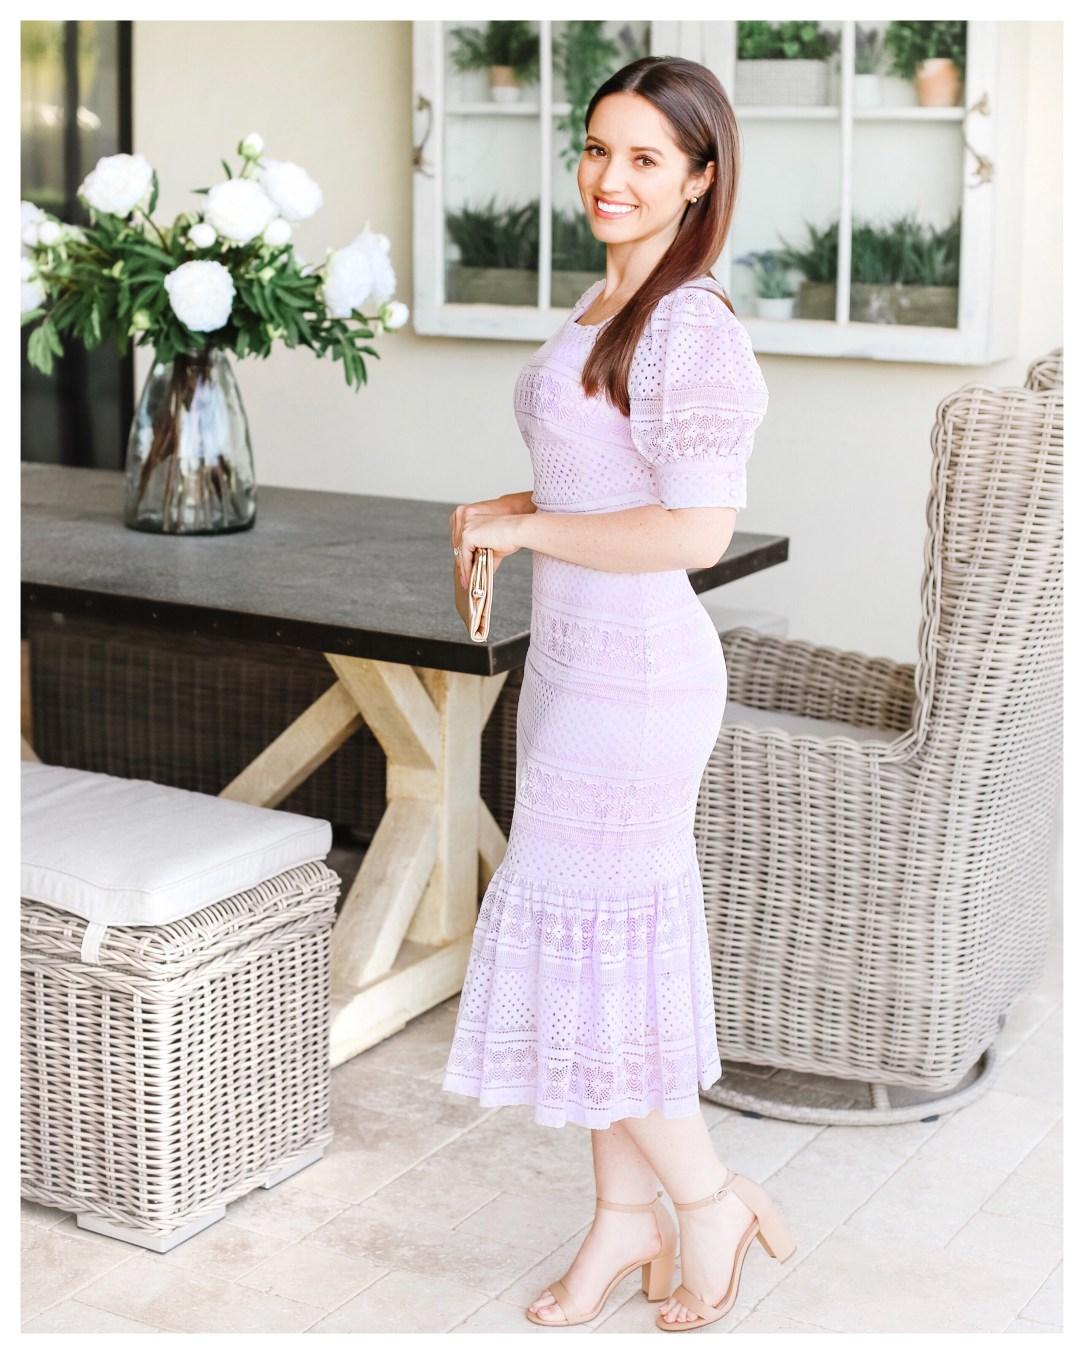 Rachel Parcell Square Neck Lace Dress on Five Foot Feminine